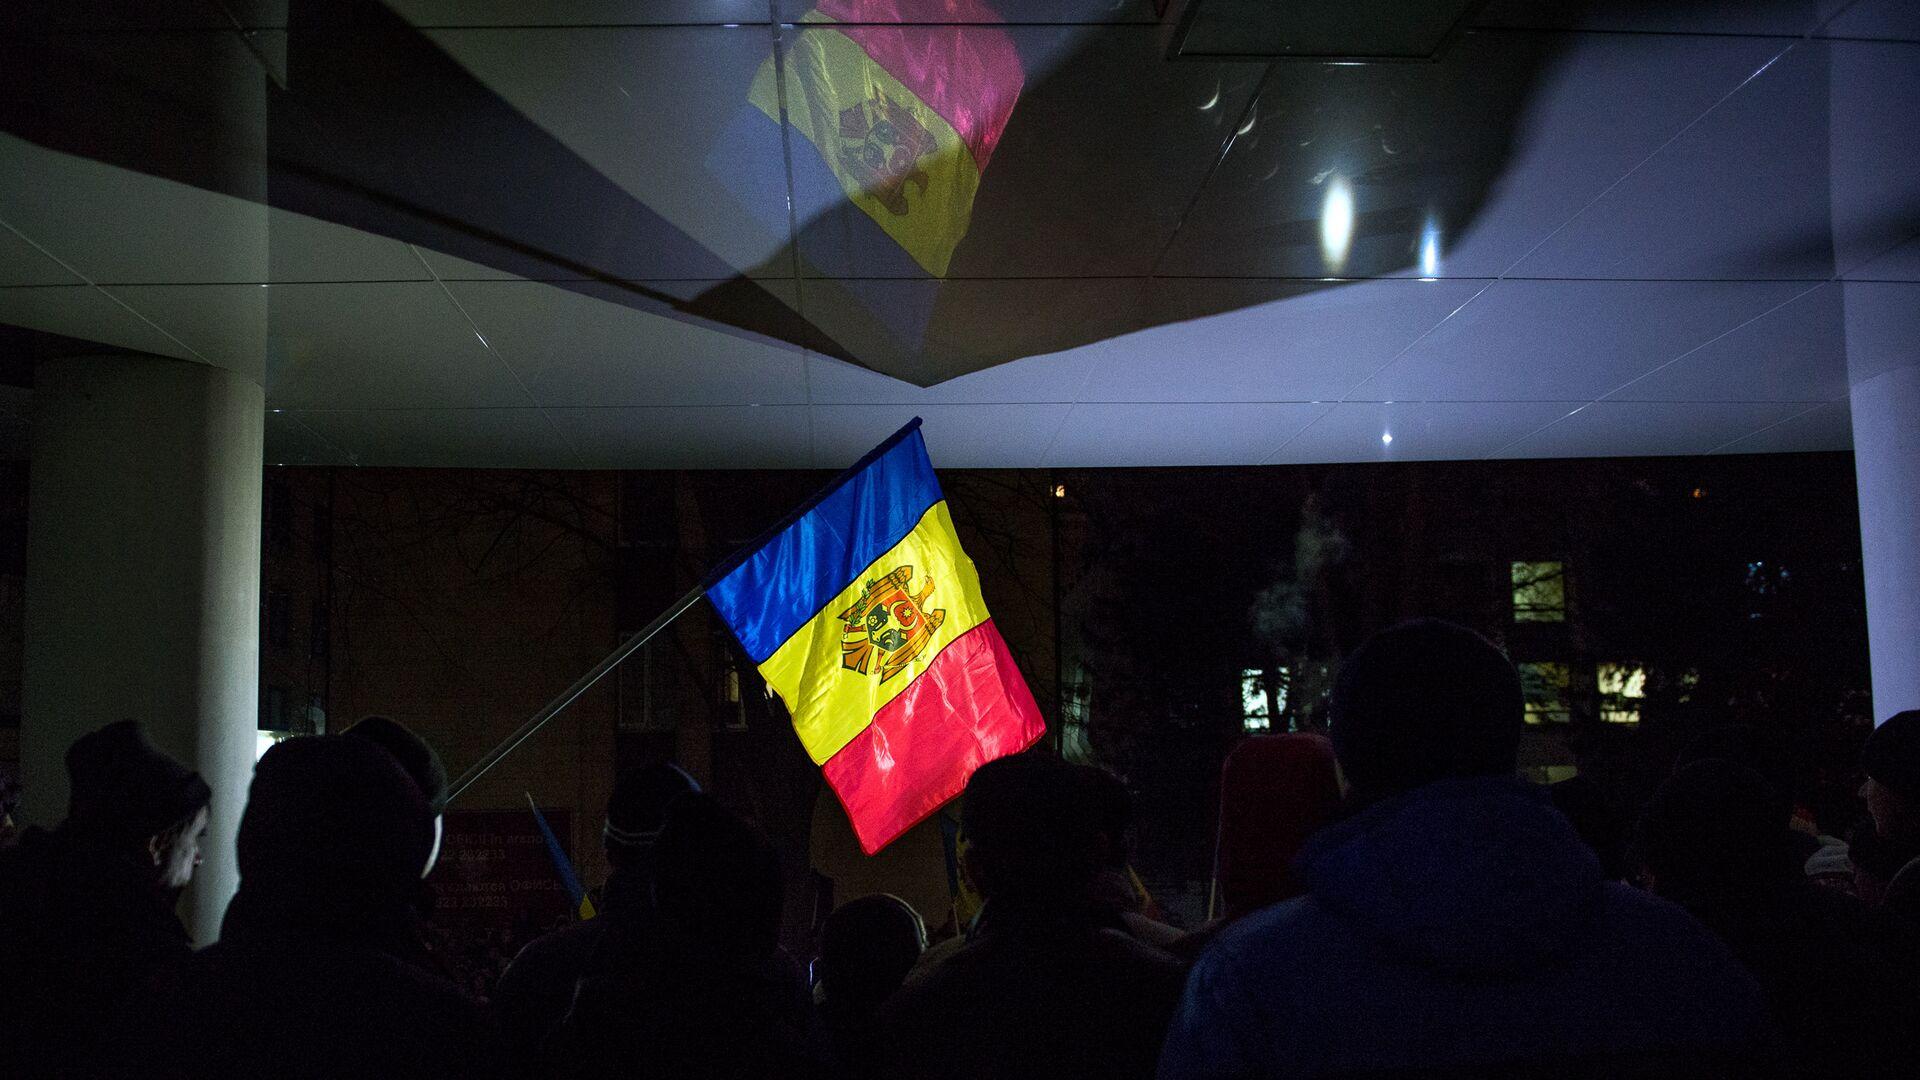 Флаг Молдавии во время акции протеста в Кишиневе - РИА Новости, 1920, 12.10.2021